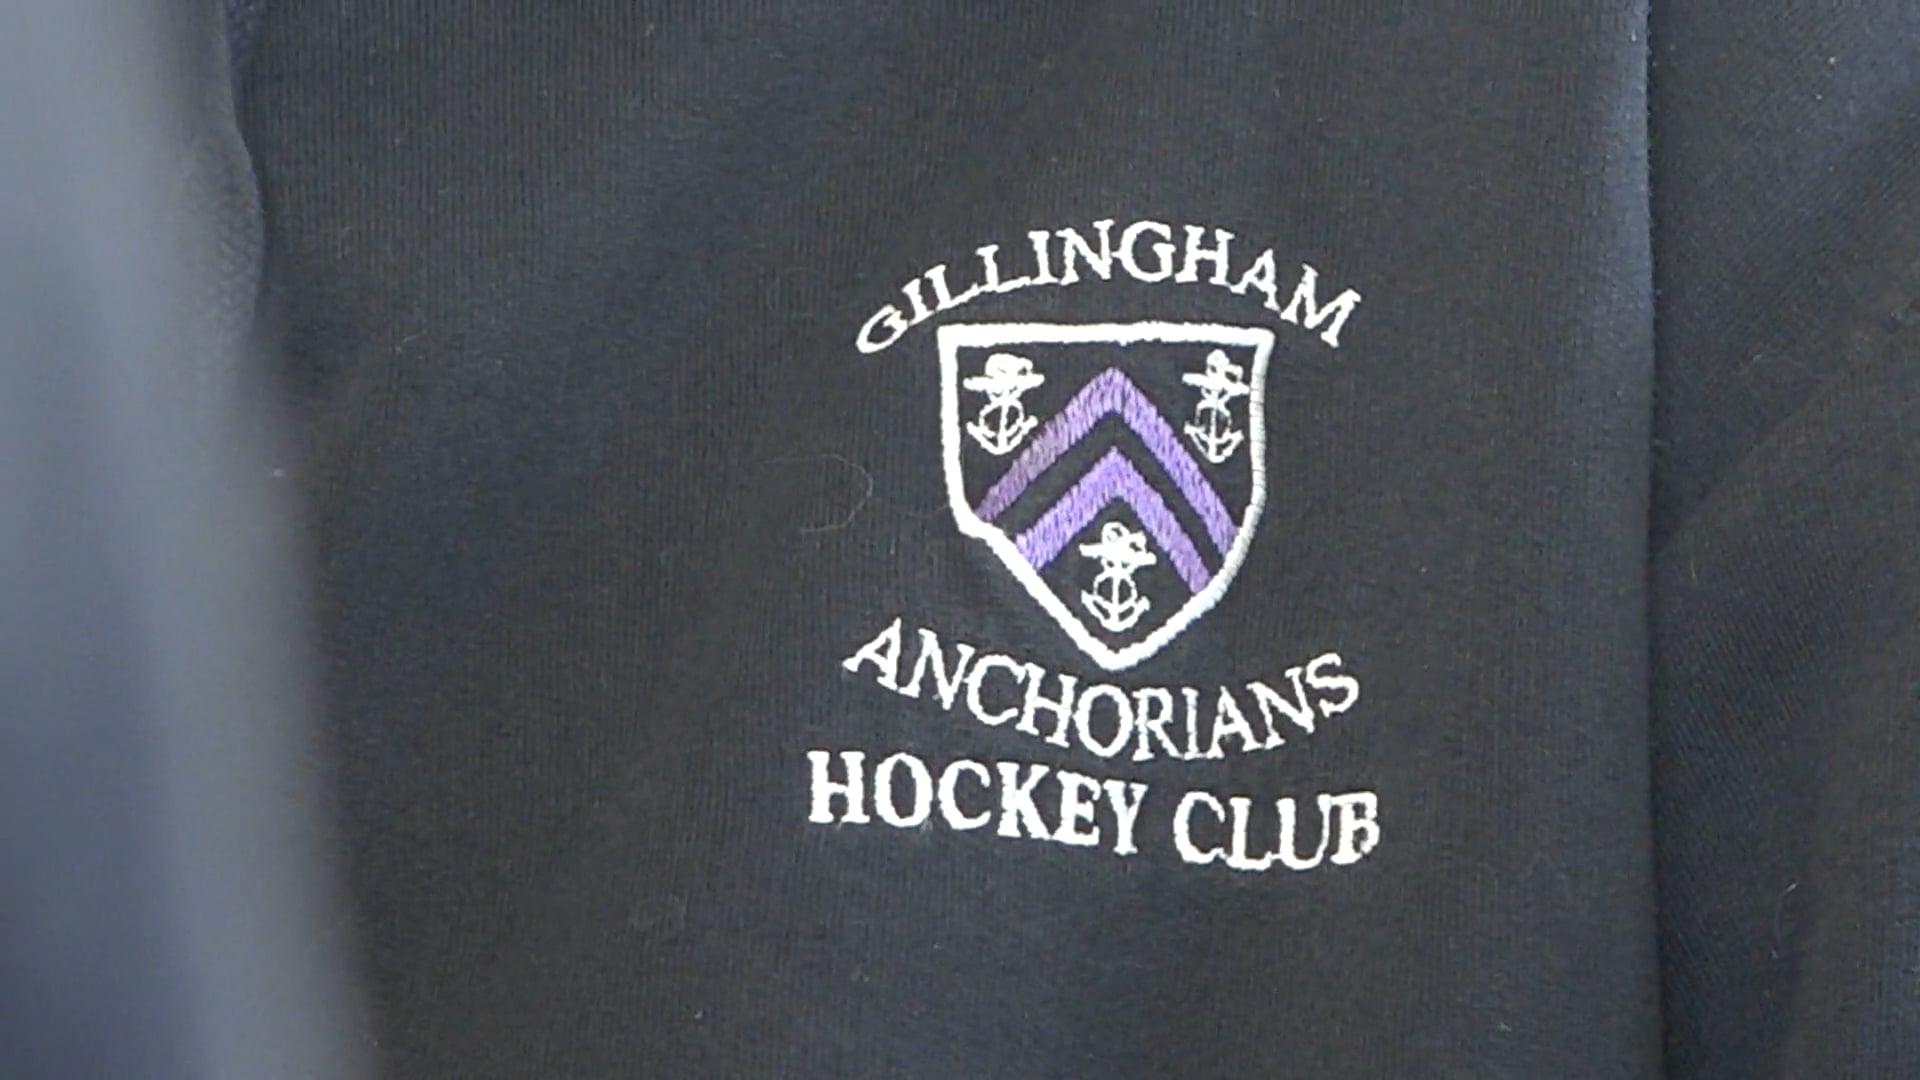 Gillingham Anchorians are Go!